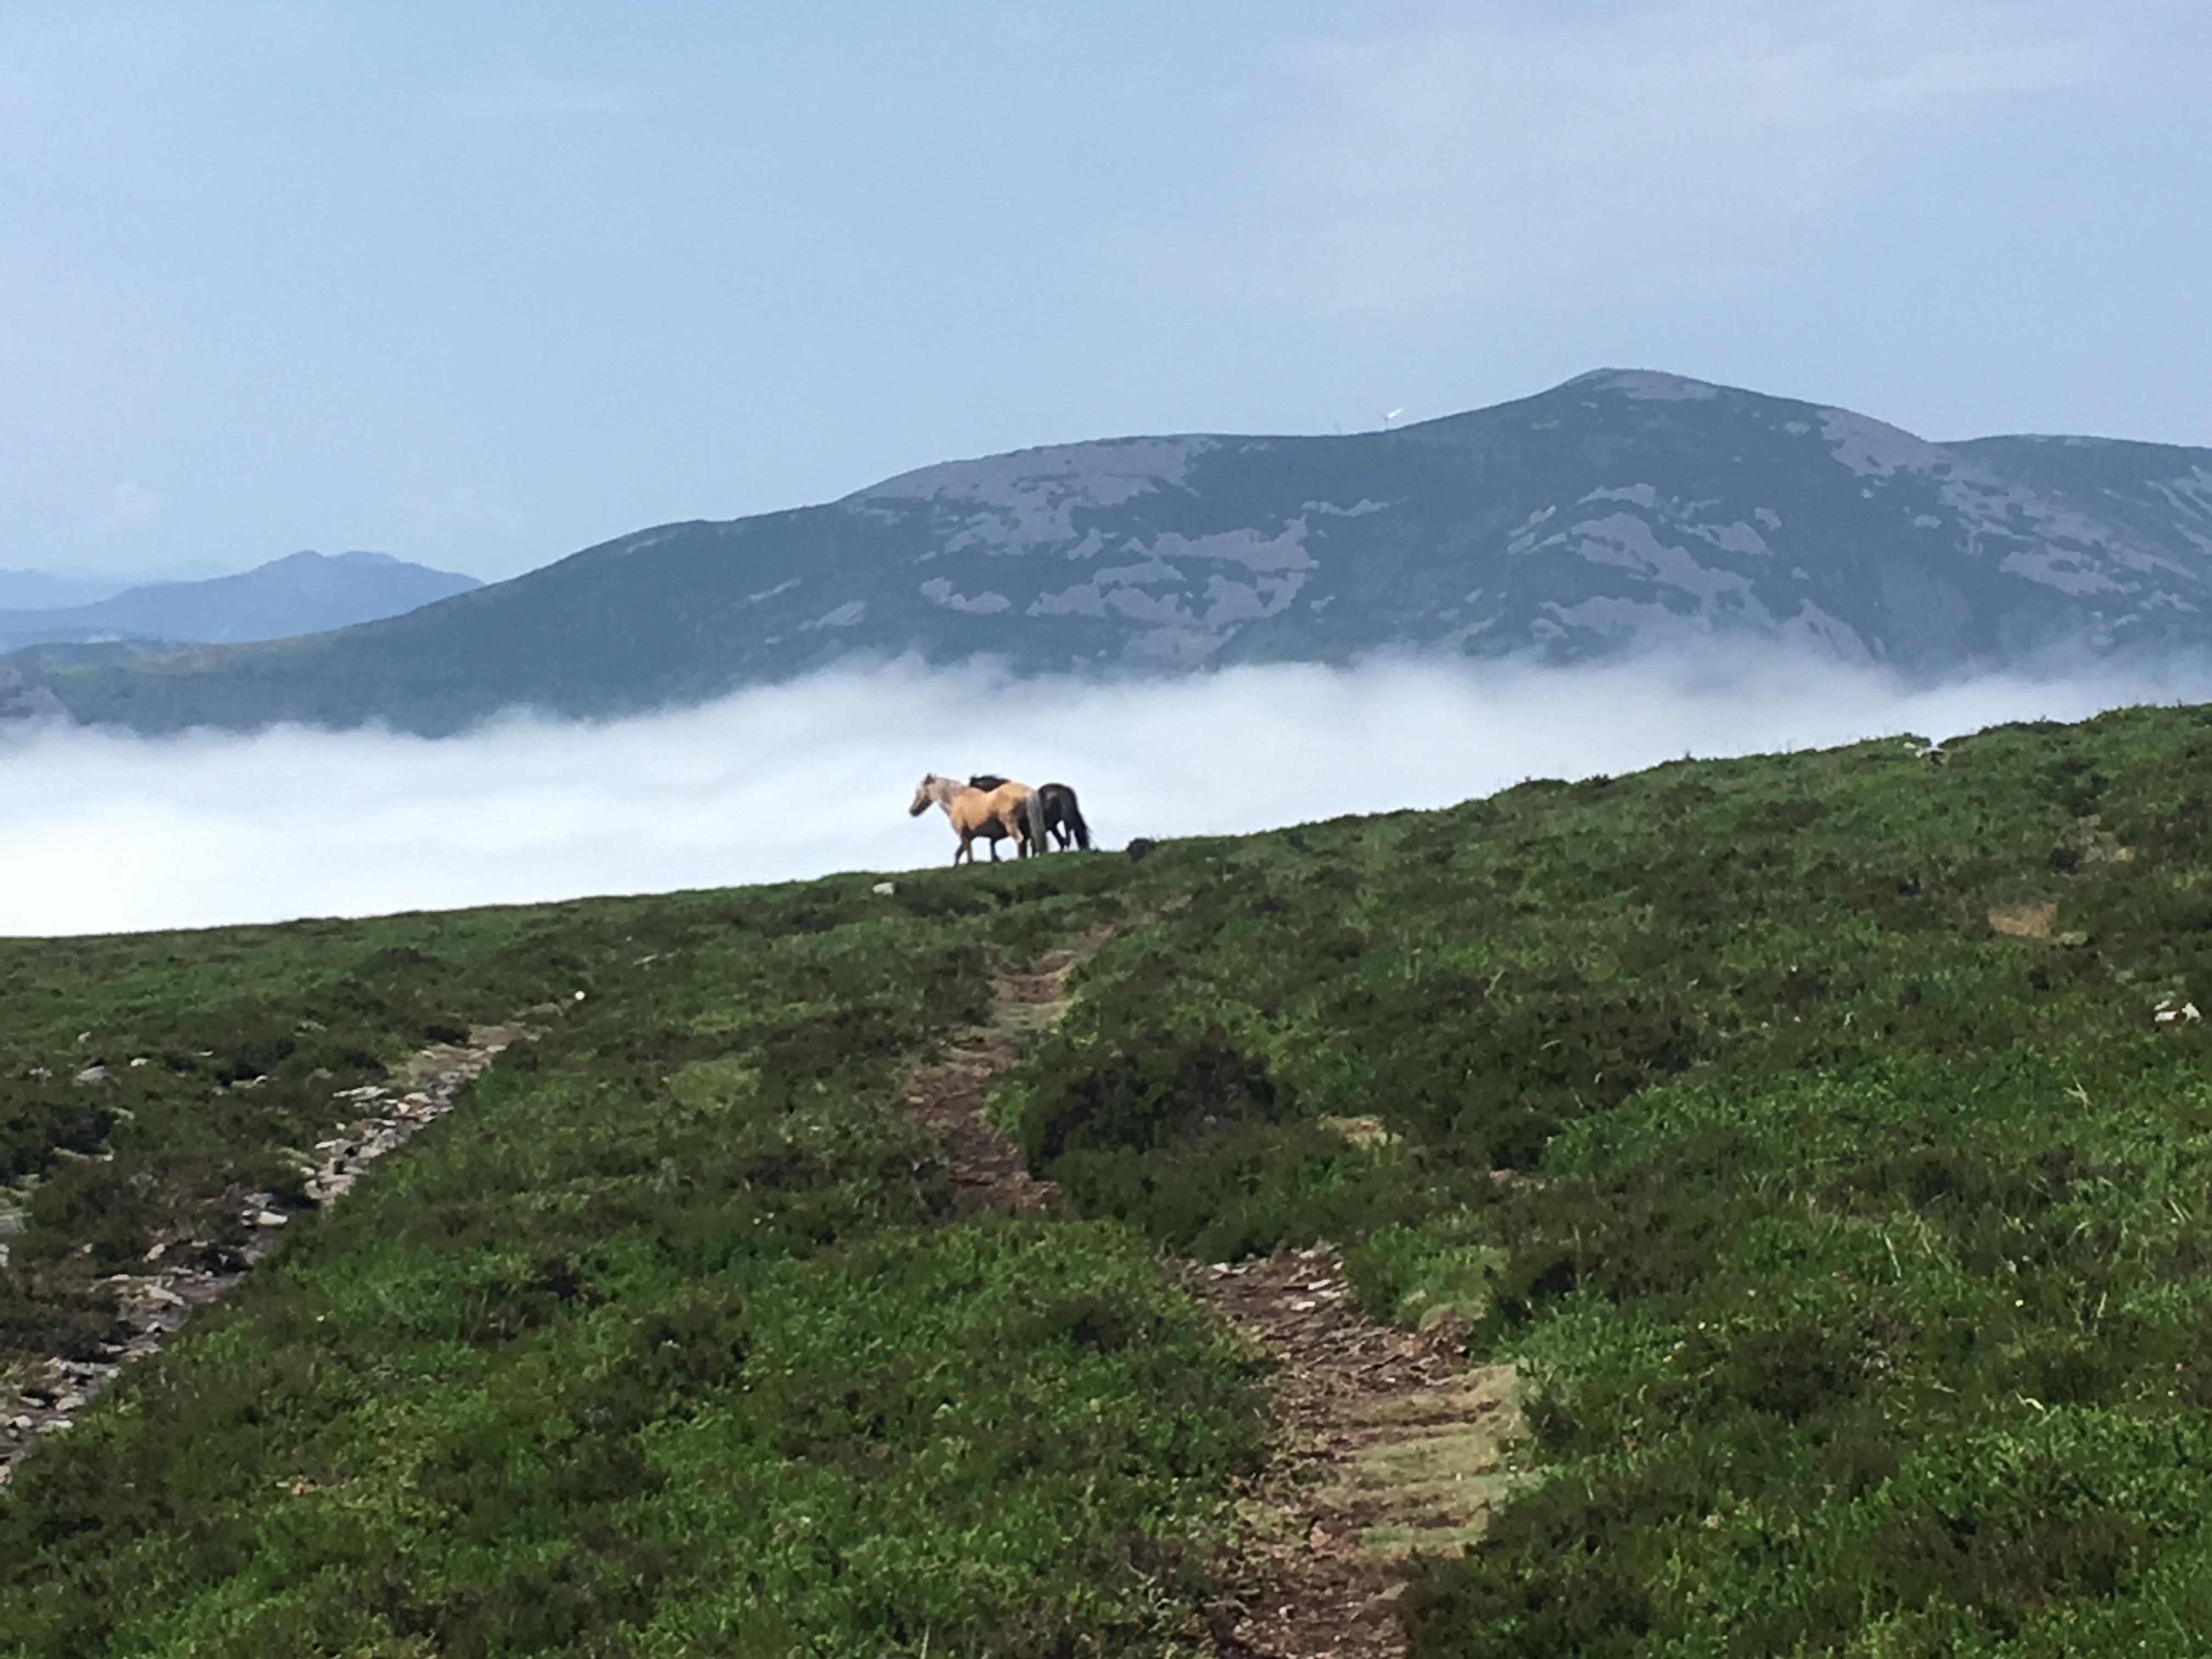 horses on the Camino de Santiago showing freedom